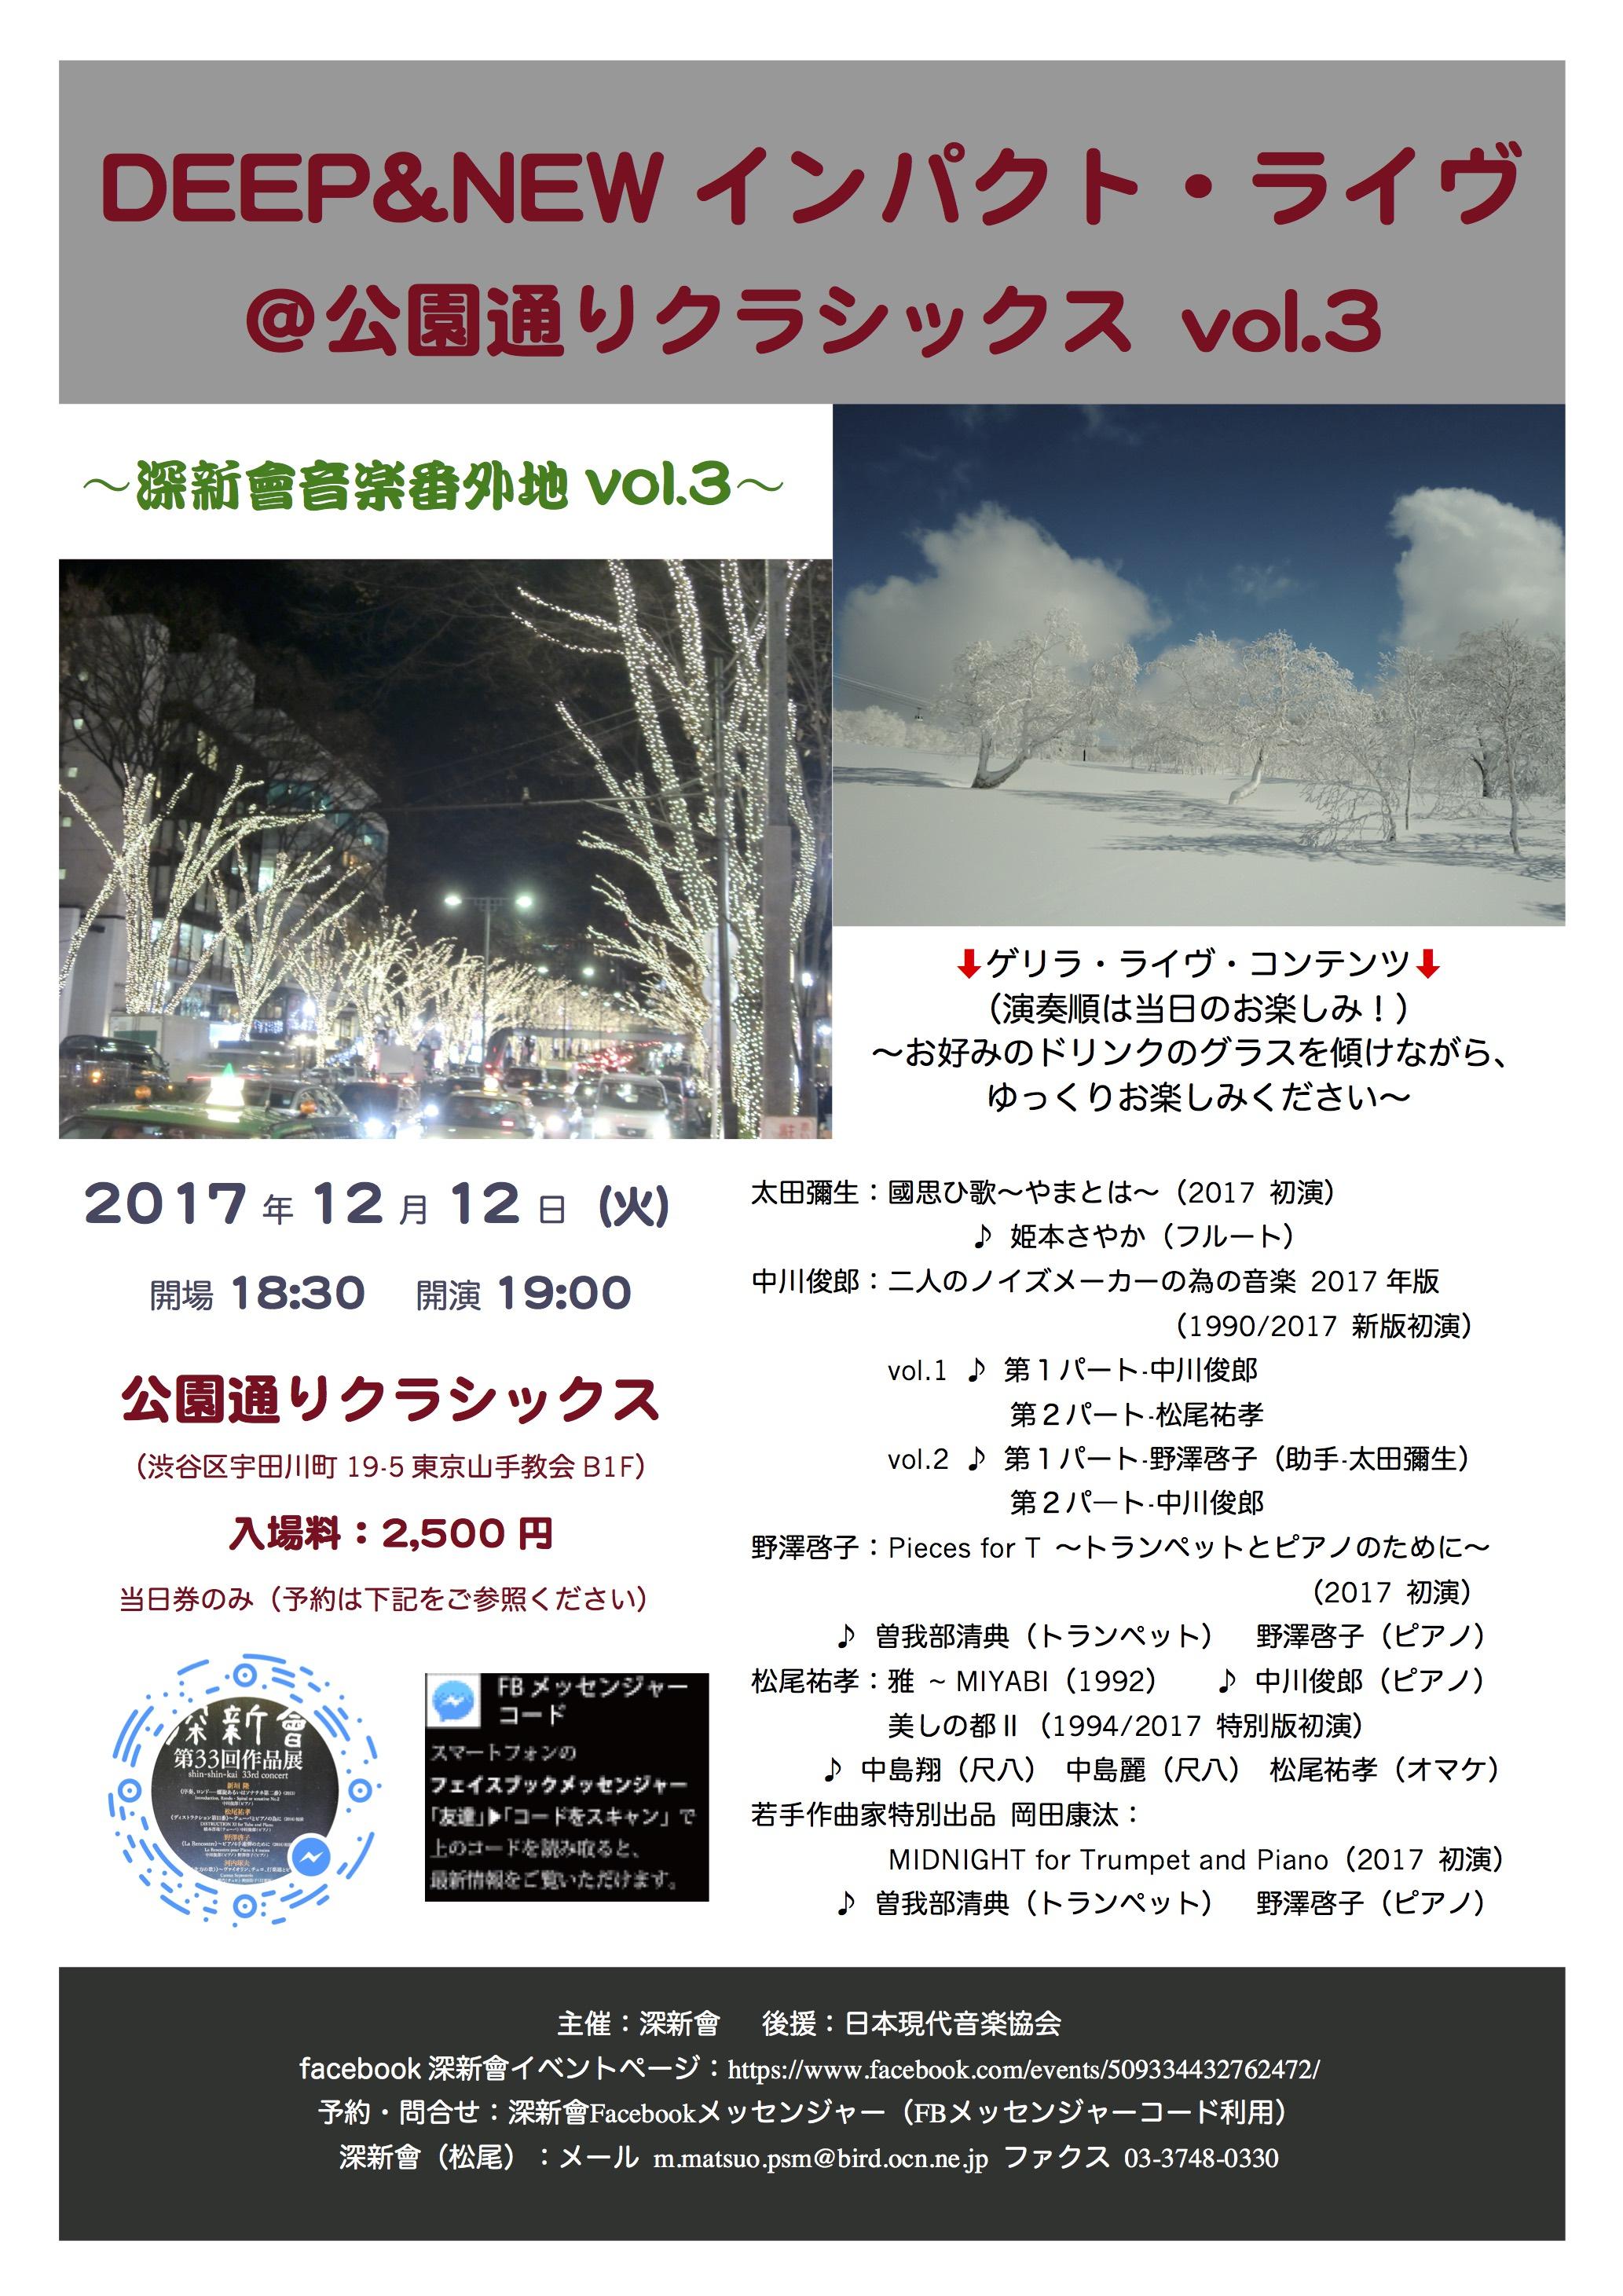 DEEP&NEW インパクト・ライヴ @ 公園通りクラシックス 〜深新會音楽番外地vol.3〜